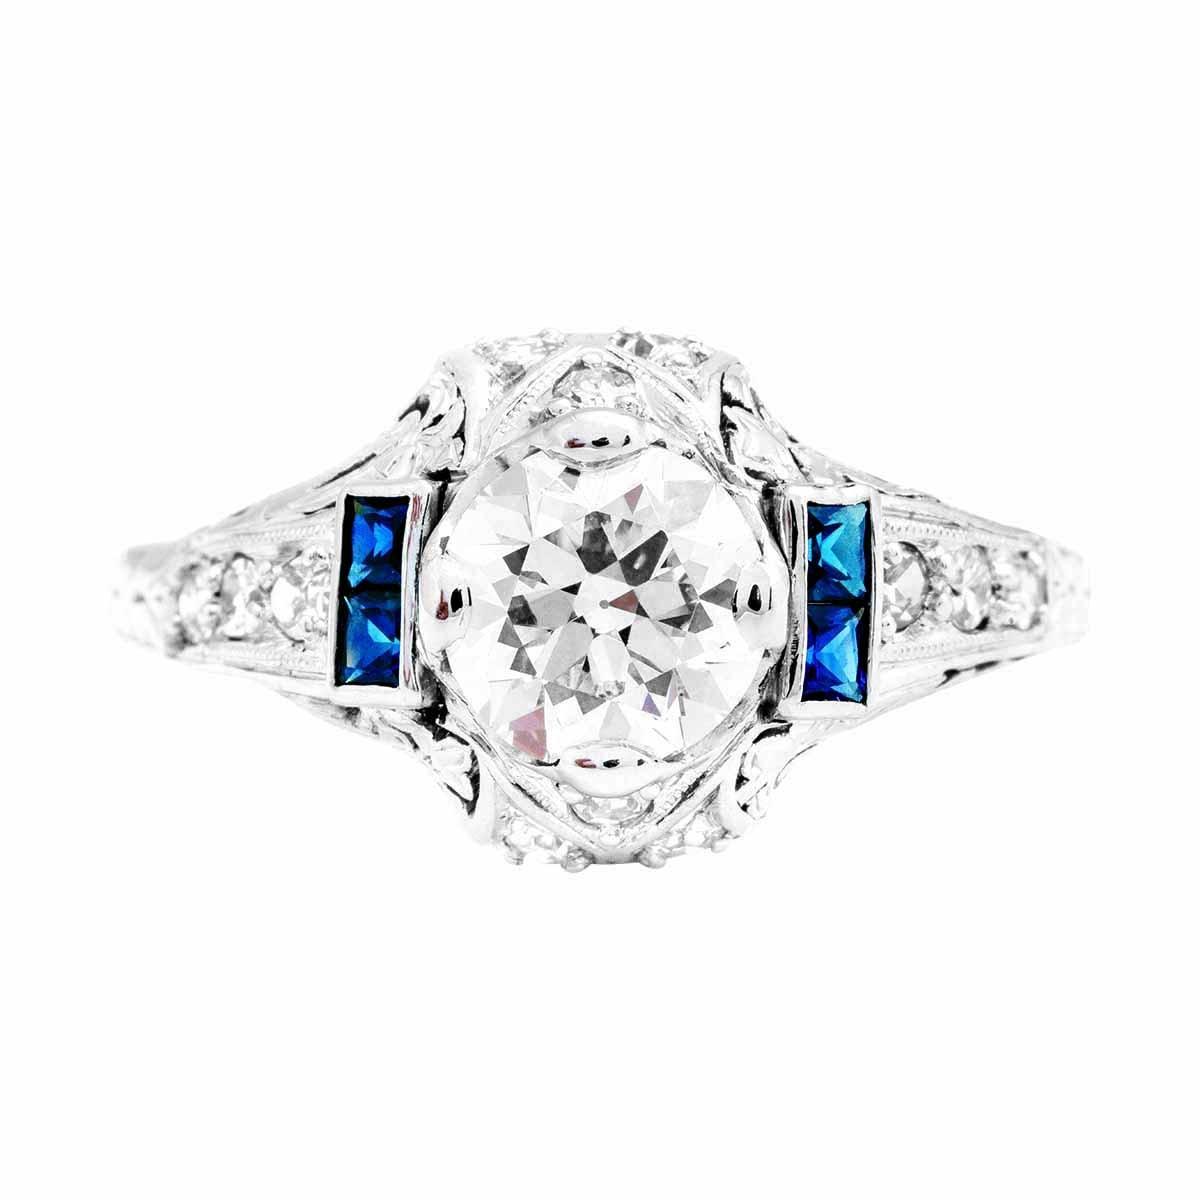 Antique 1.36 CTW Diamonds & Sapphire Ring